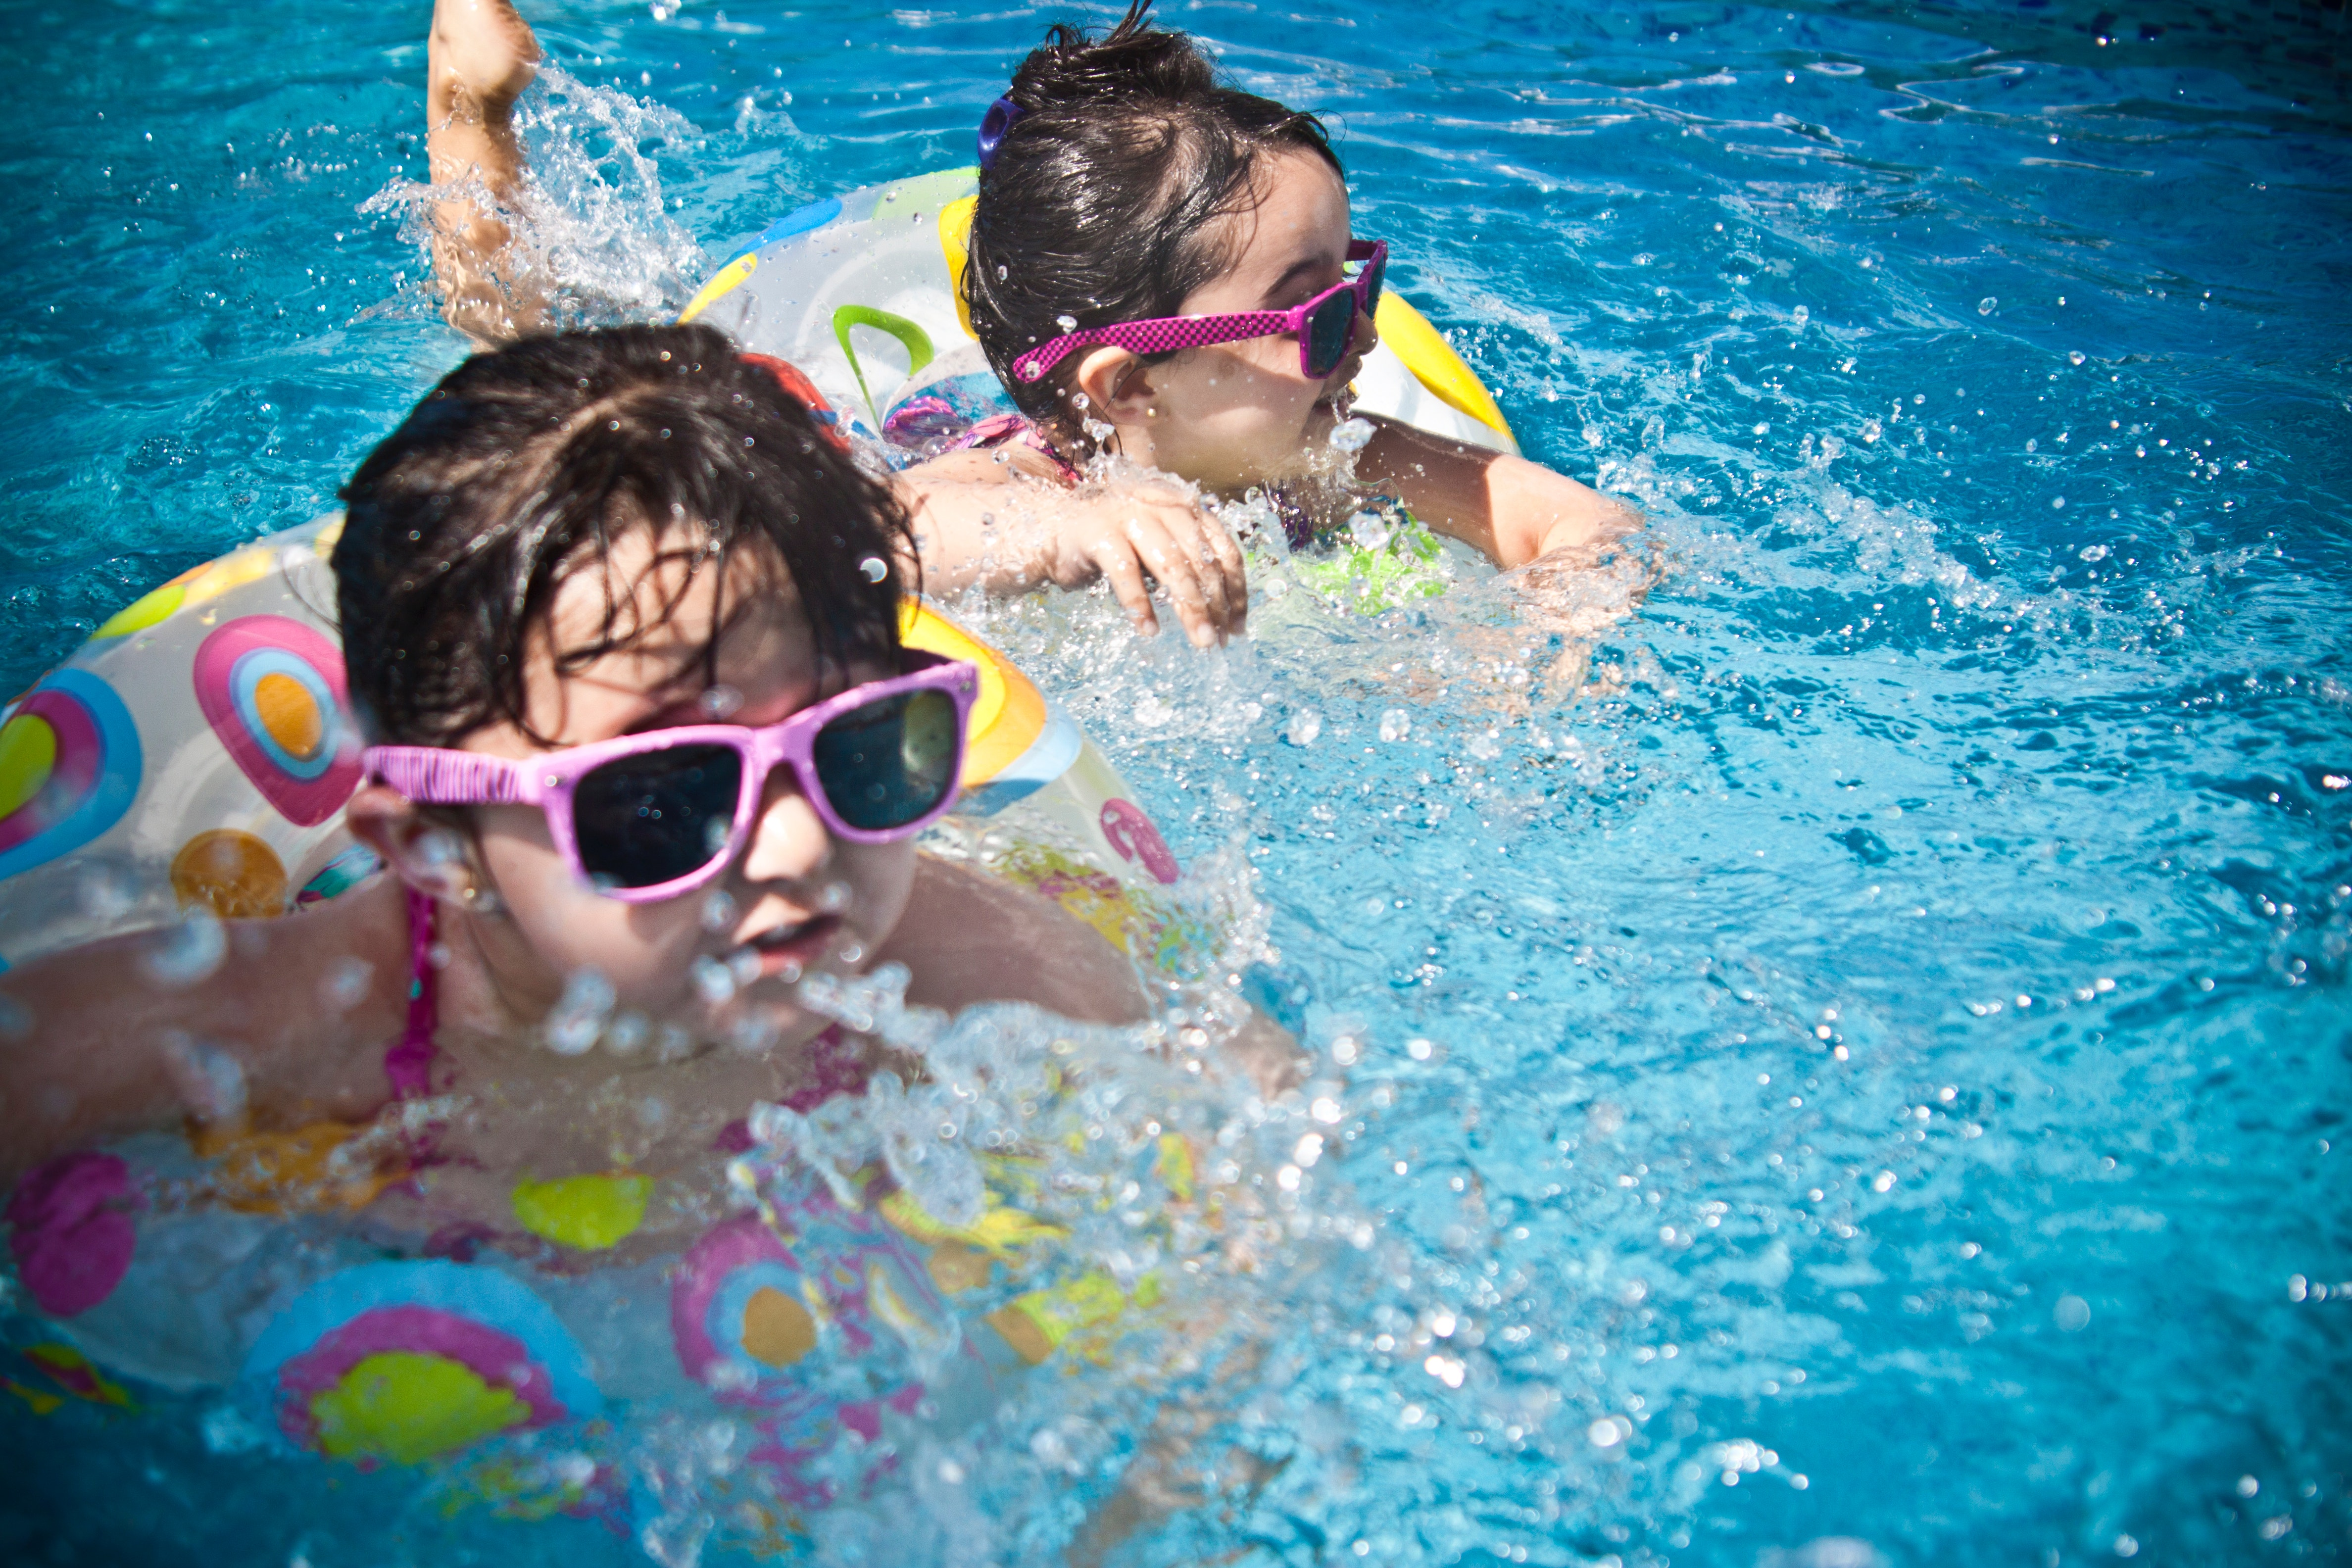 Kids in Pools